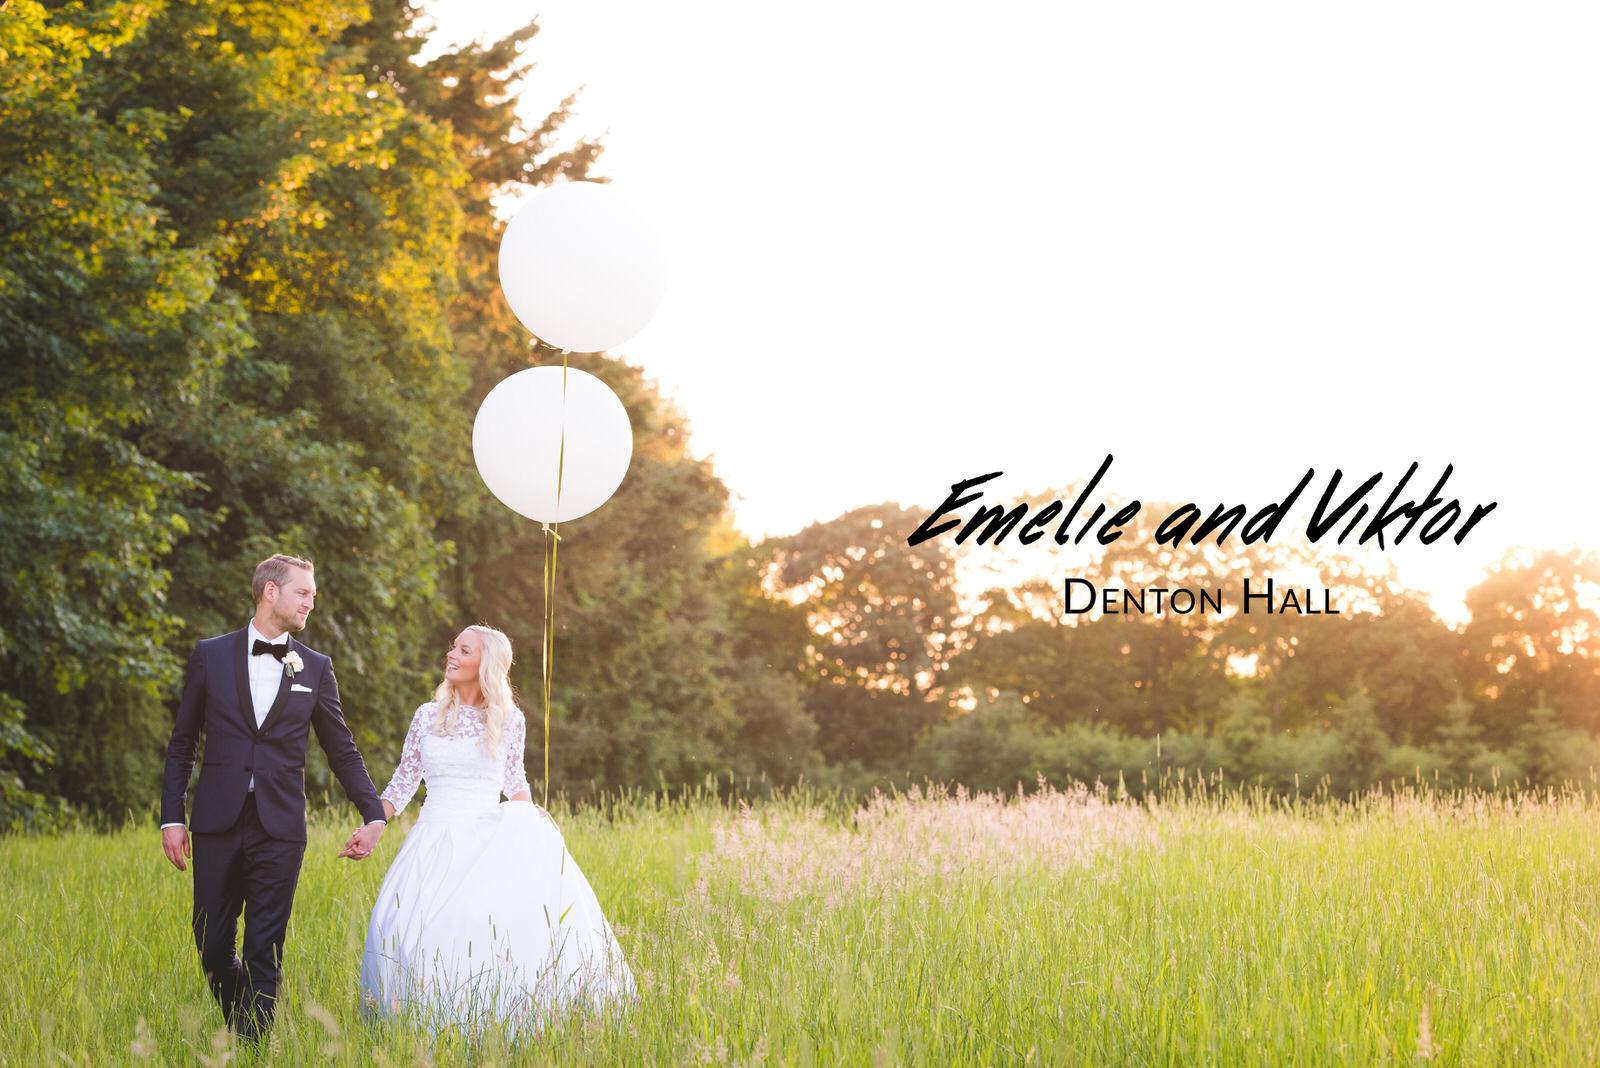 Emelie and Viktor's Wedding - Denton Hall